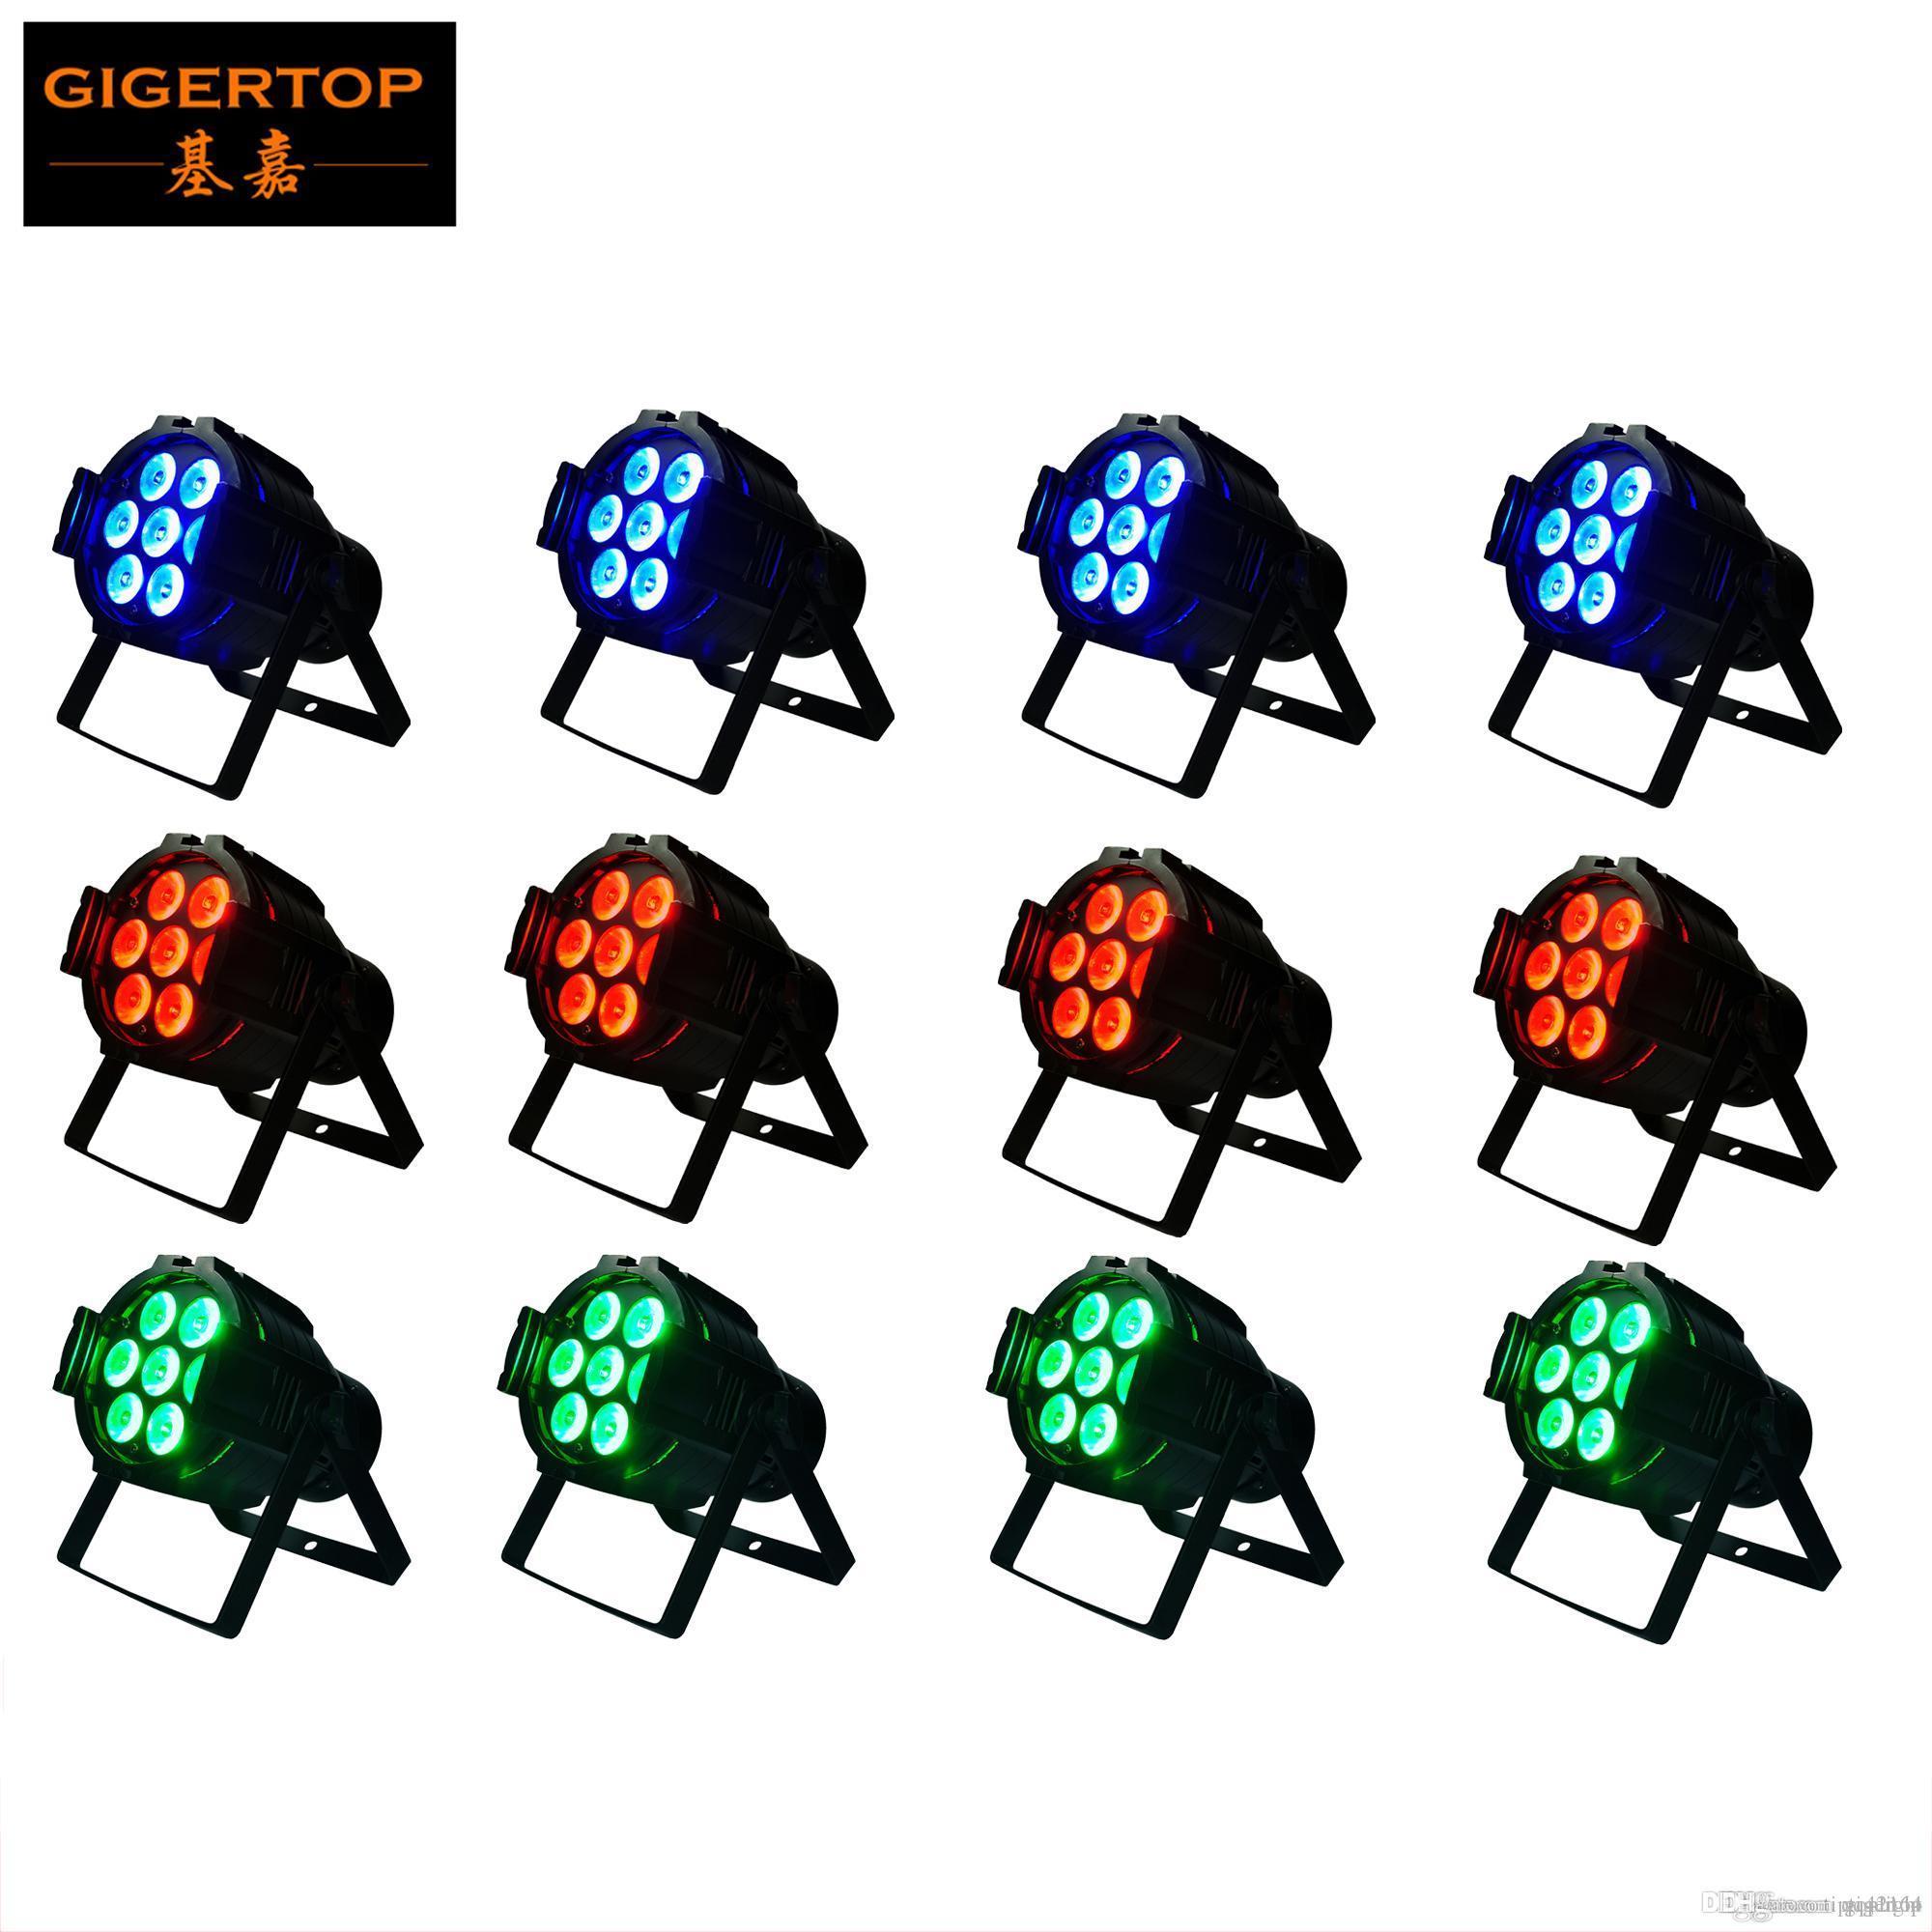 12PCS / 많은 핫 세일 7x12W 4IN1 RGBW LED 무대 조명 높은 전원 LED 파 캔 스트로브 효과 DMX512 DJ 디스코 장비 컨트롤러 TP-P50